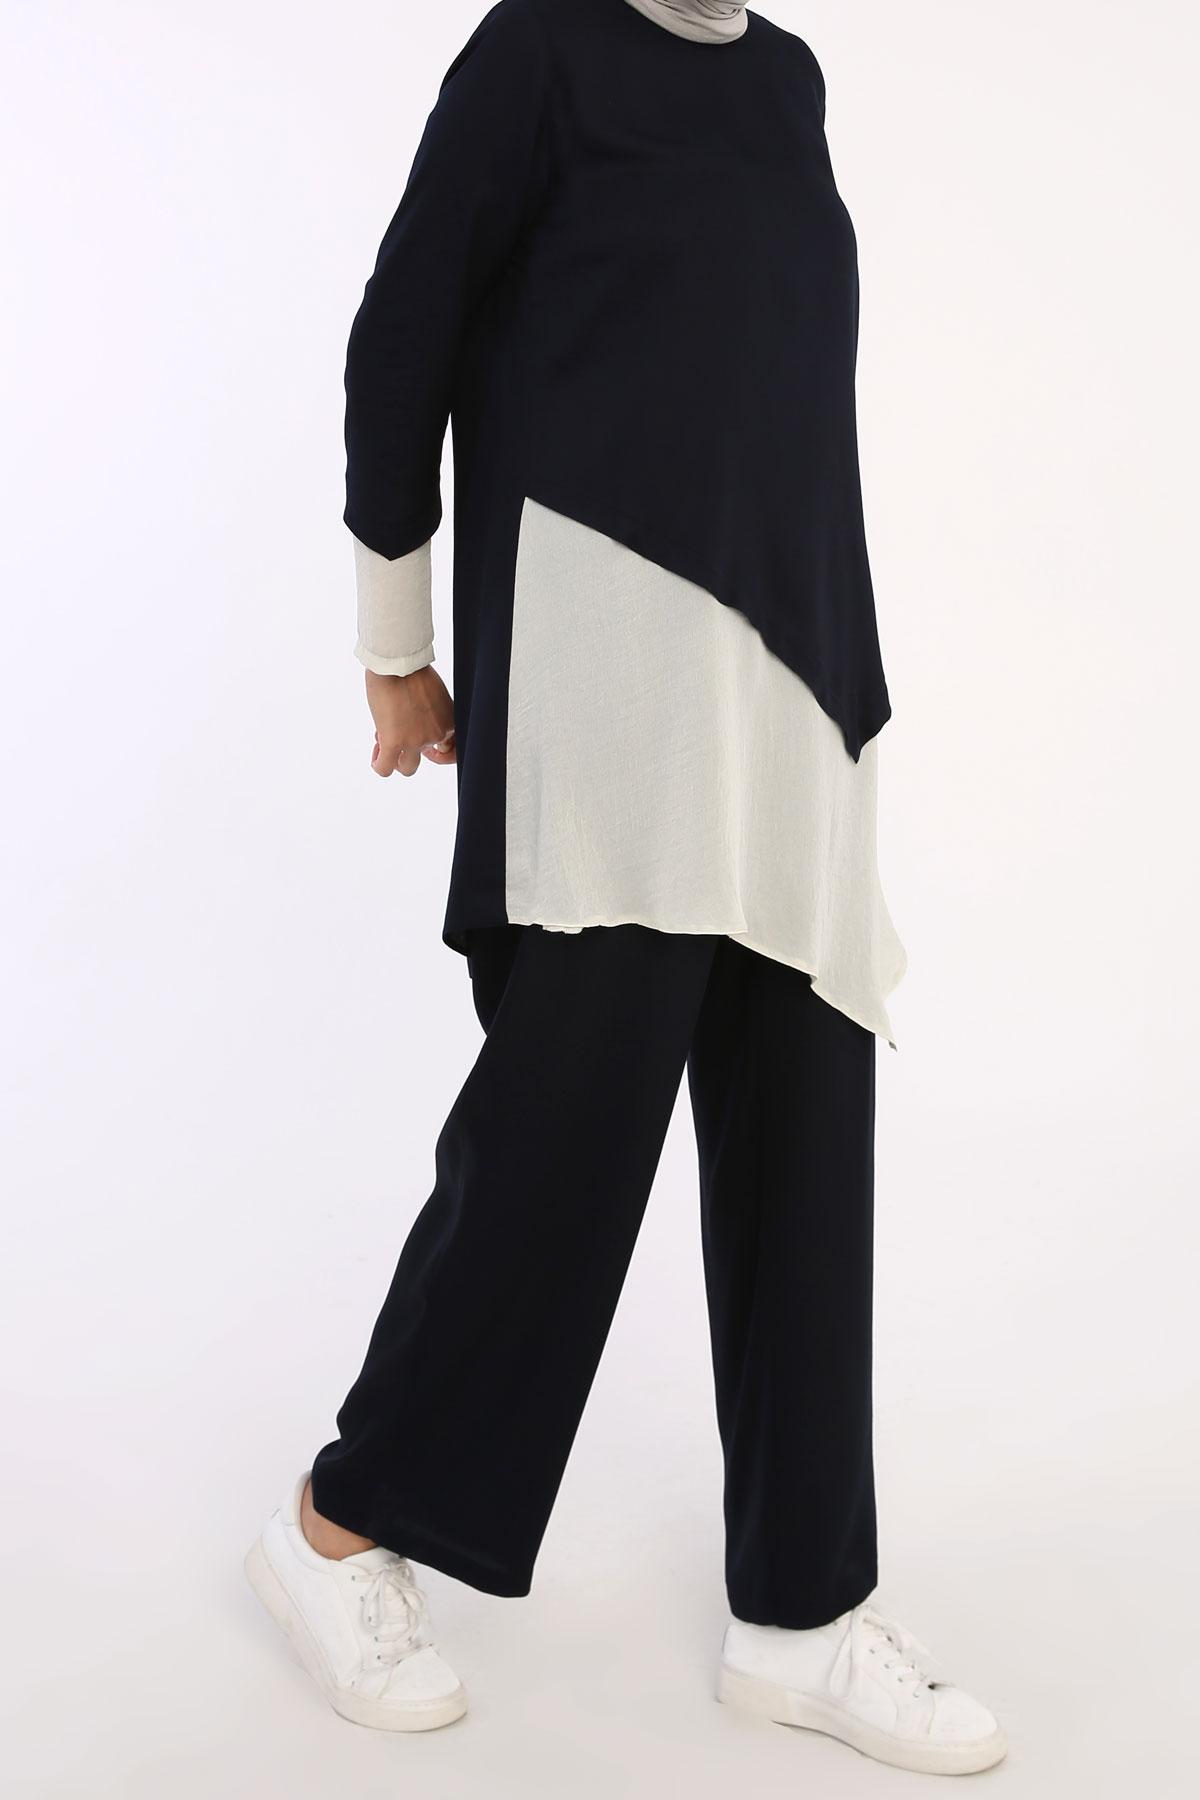 Women's Asymmetric Cut Navy Blue Viscose Tunic & Pants Set